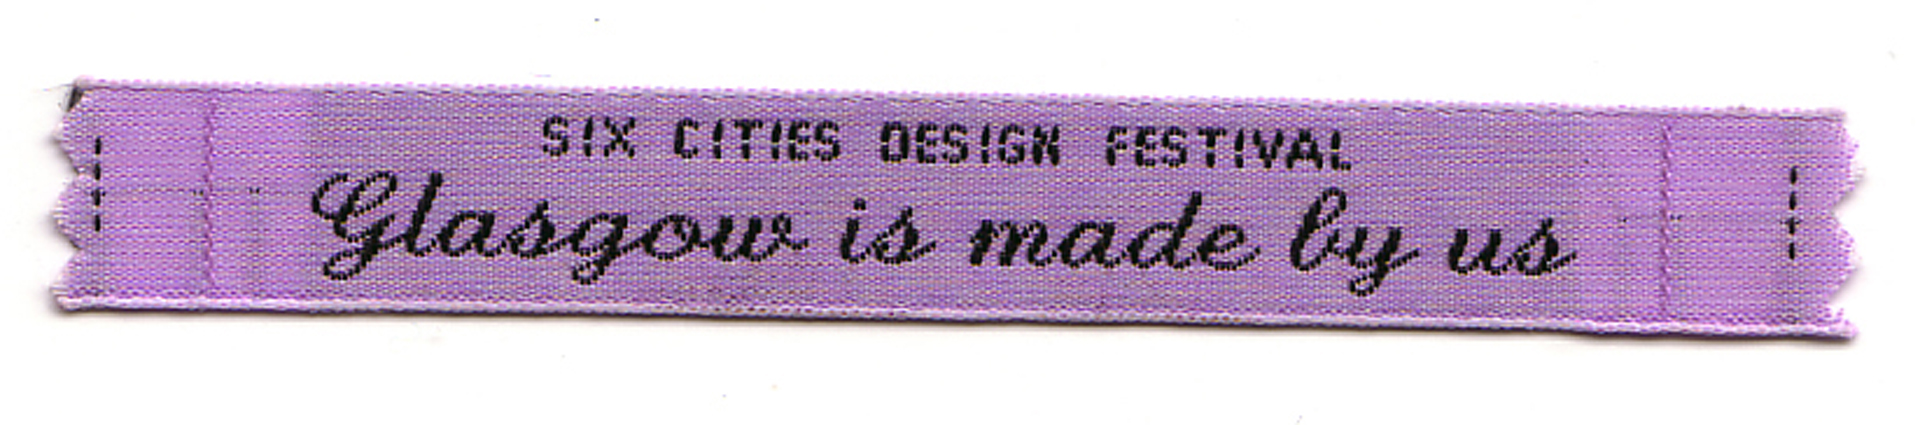 Six Cities Design Festival.jpg